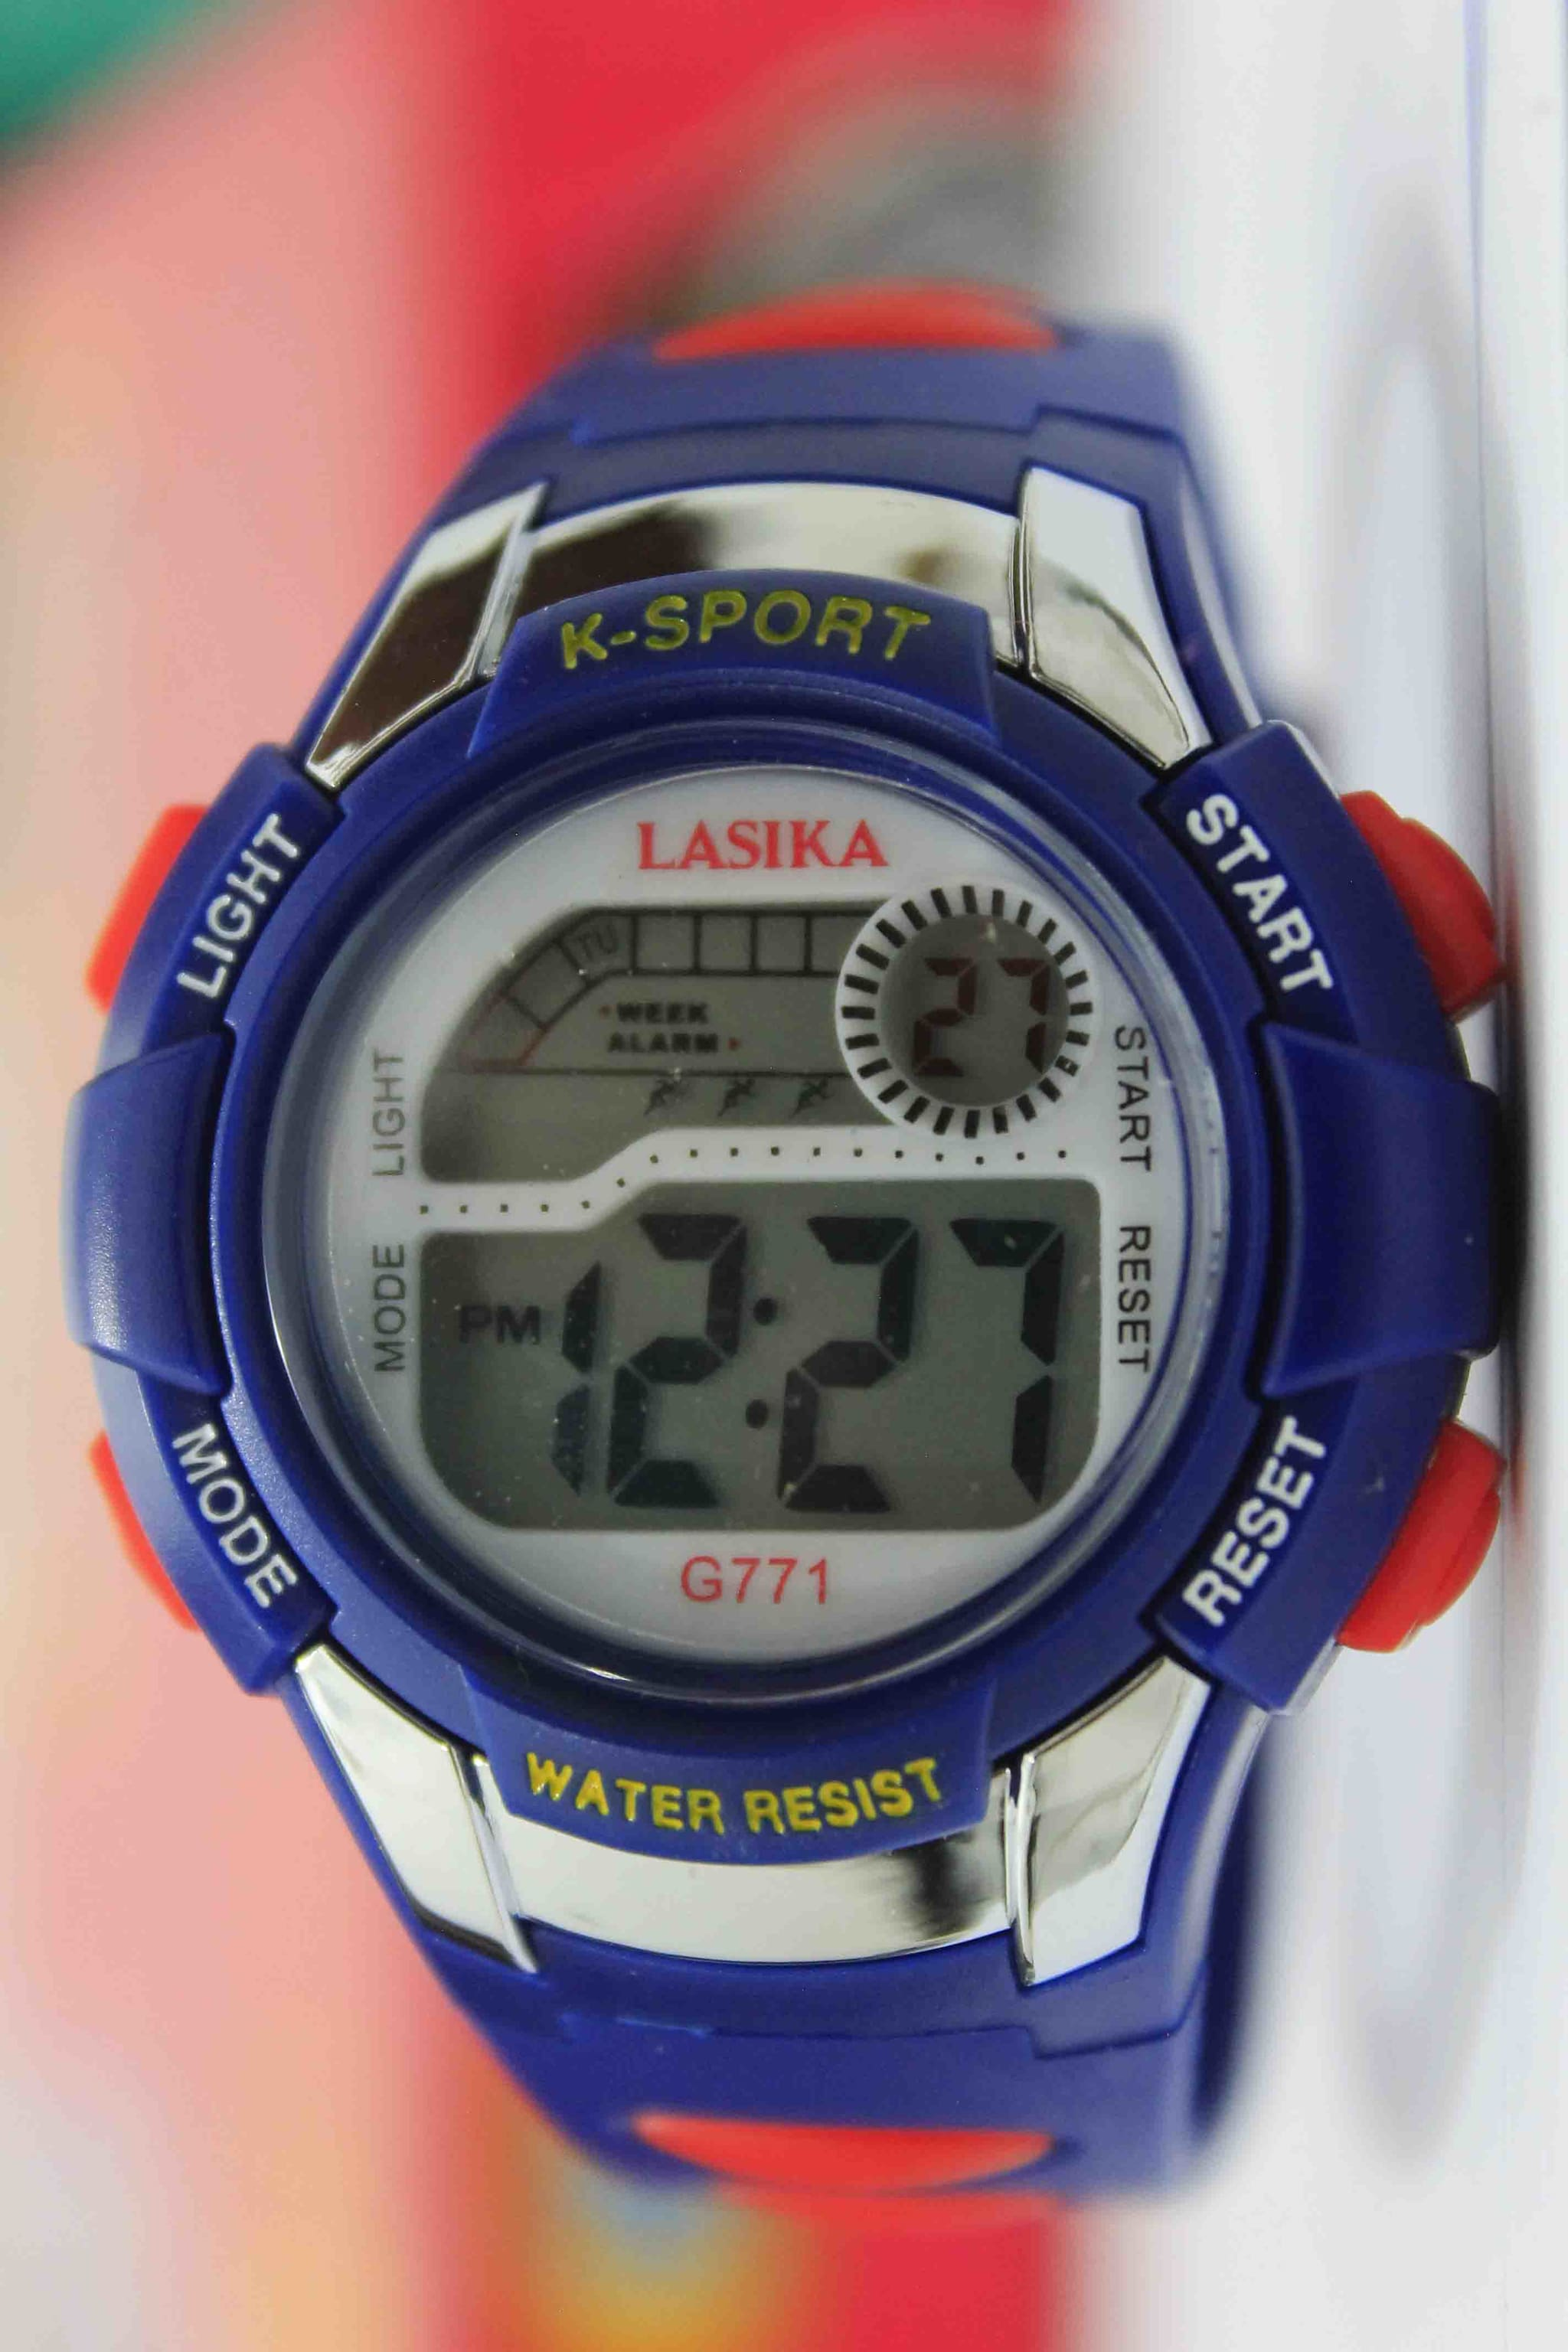 ulasan produk jam tangan anak perempuan laki kelas 5 sd anti air terbaru toserba24 tokopedia